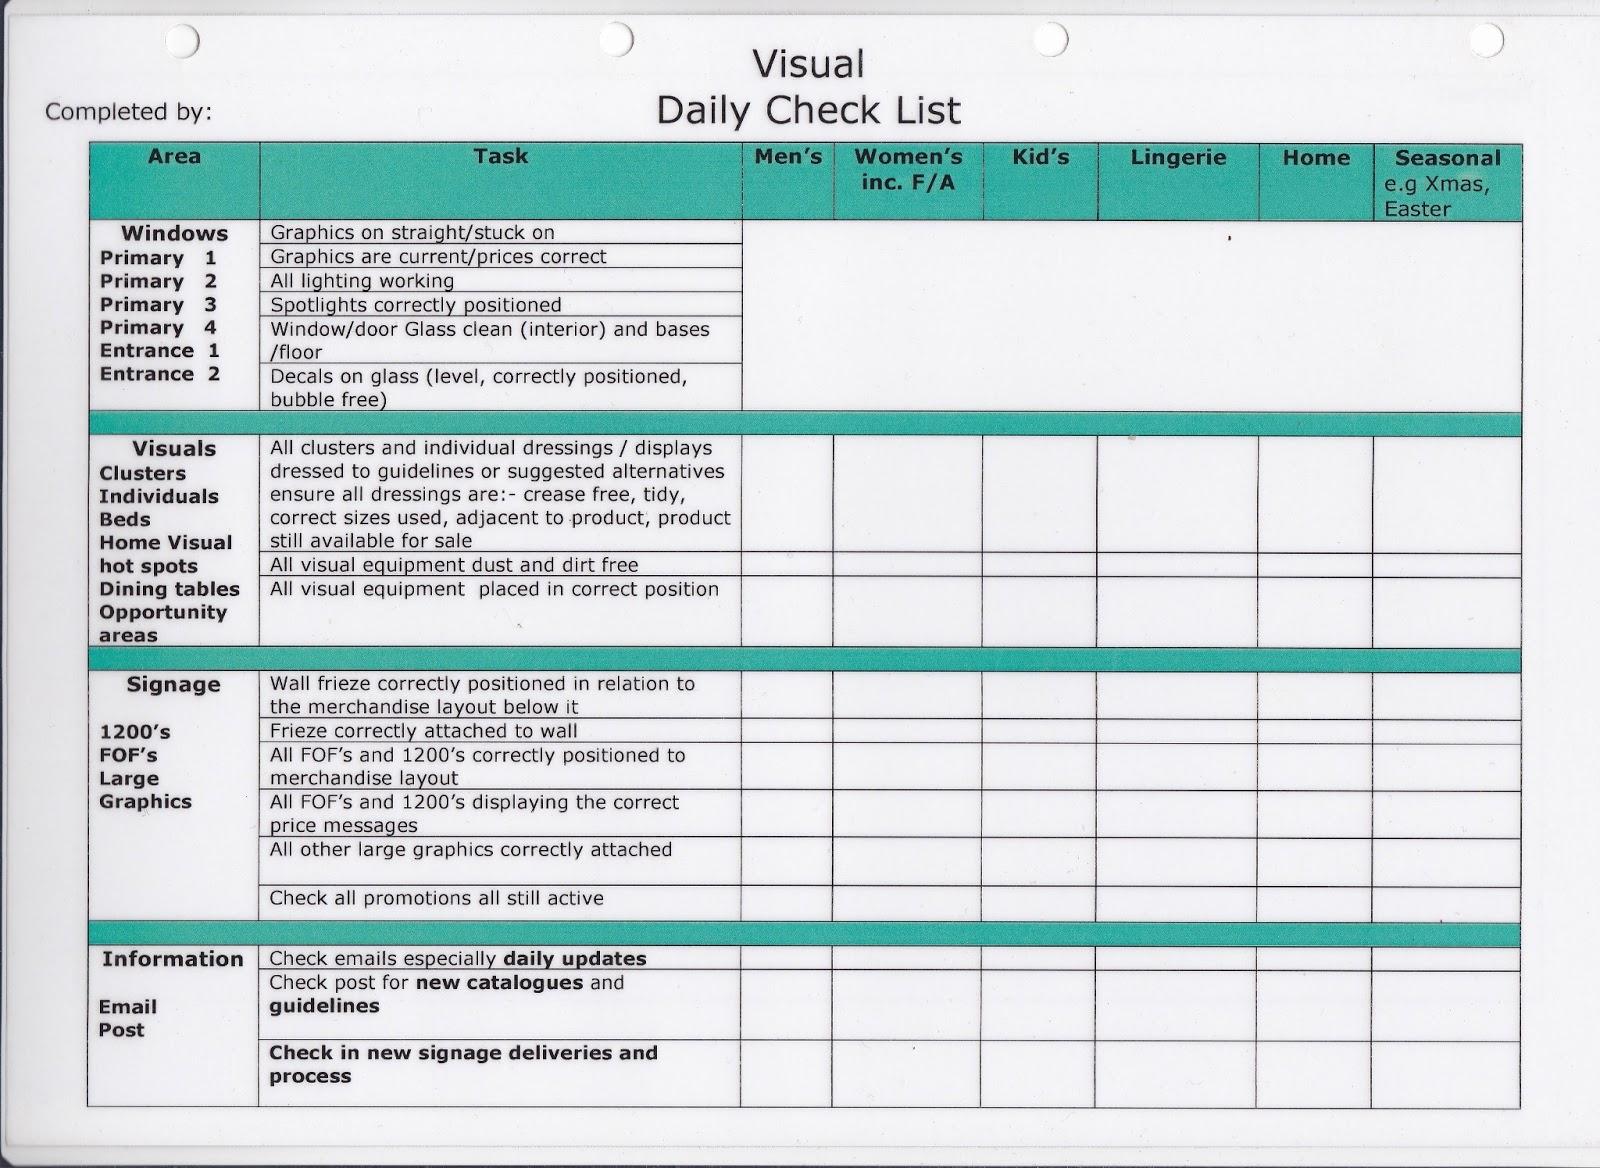 Visual Merchandising 101 VM Check lists